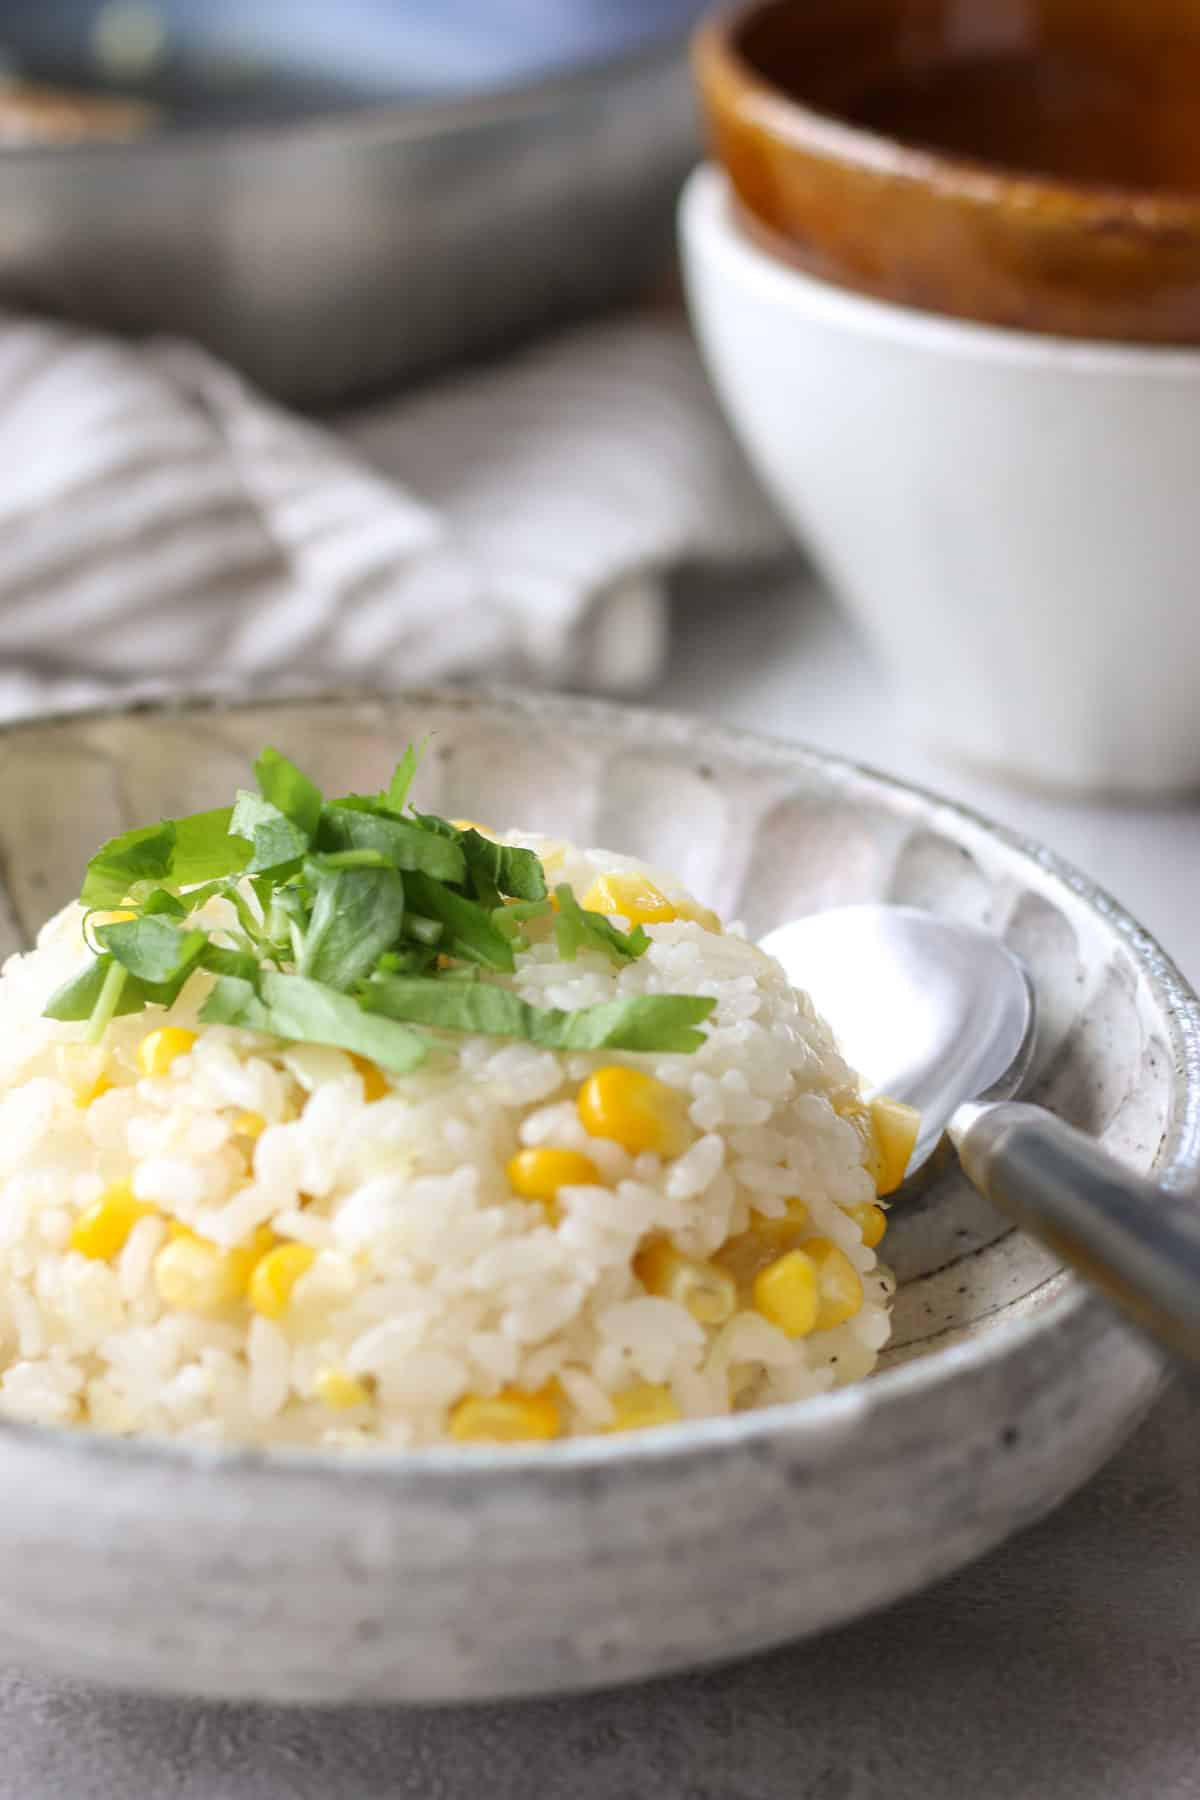 Japanese corn fried rice (chahan)